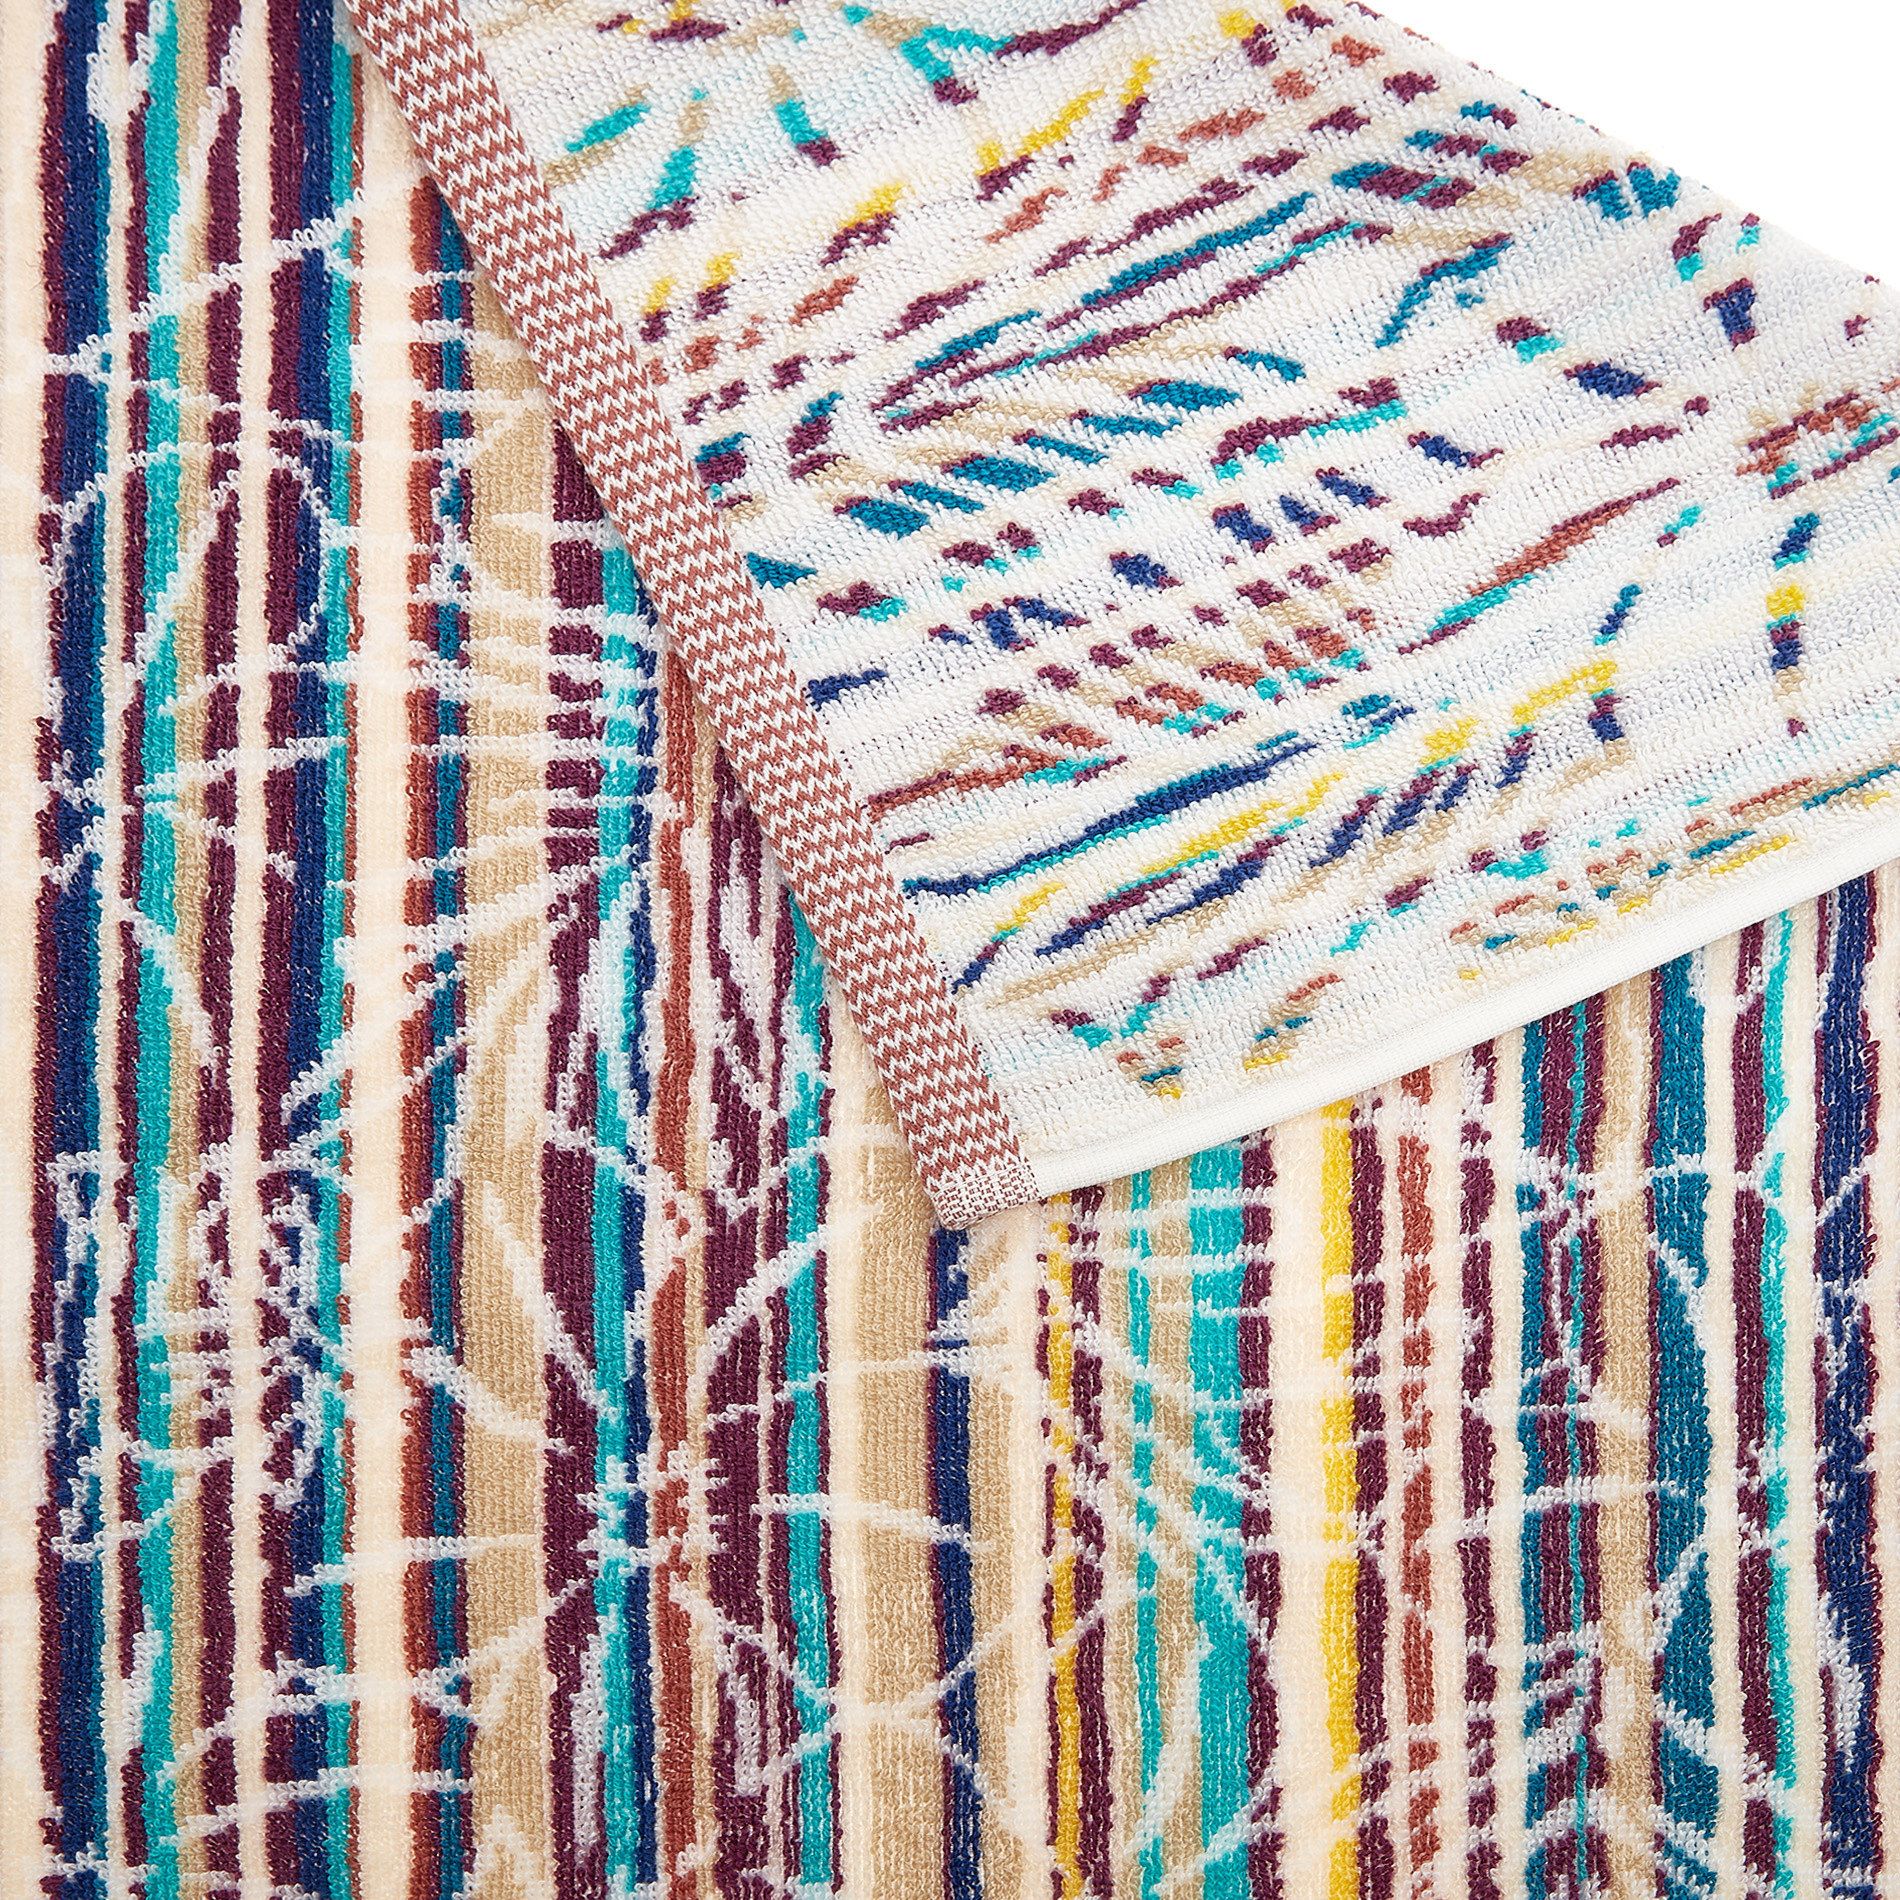 Asciugamano cotone jacquard motivo tropicale, Multicolor, large image number 2